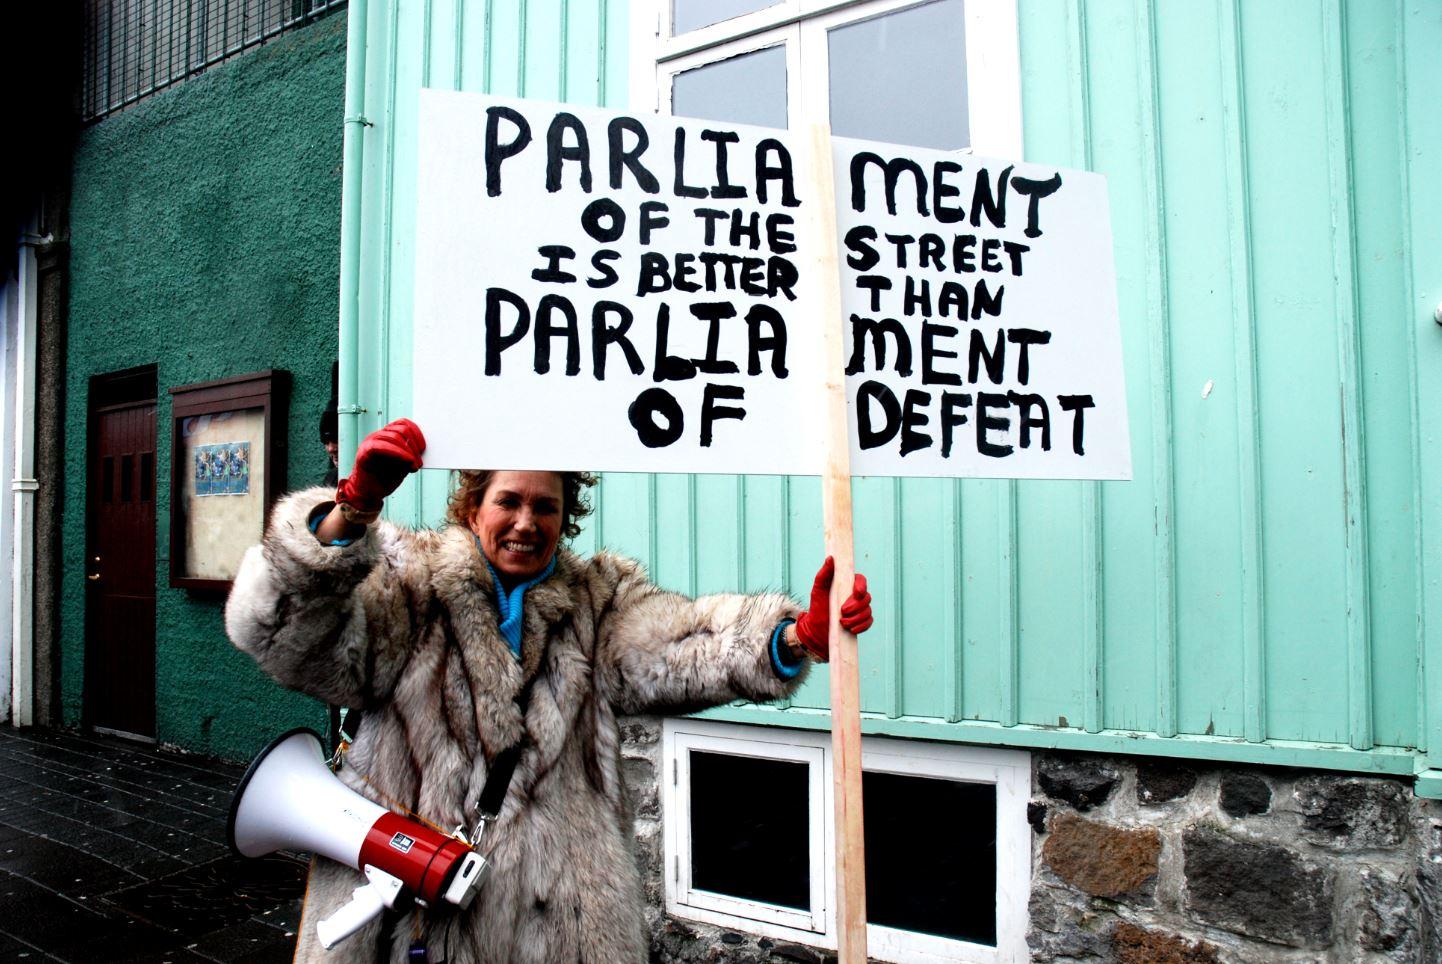 National pride gave Icelanders tunnel-vision